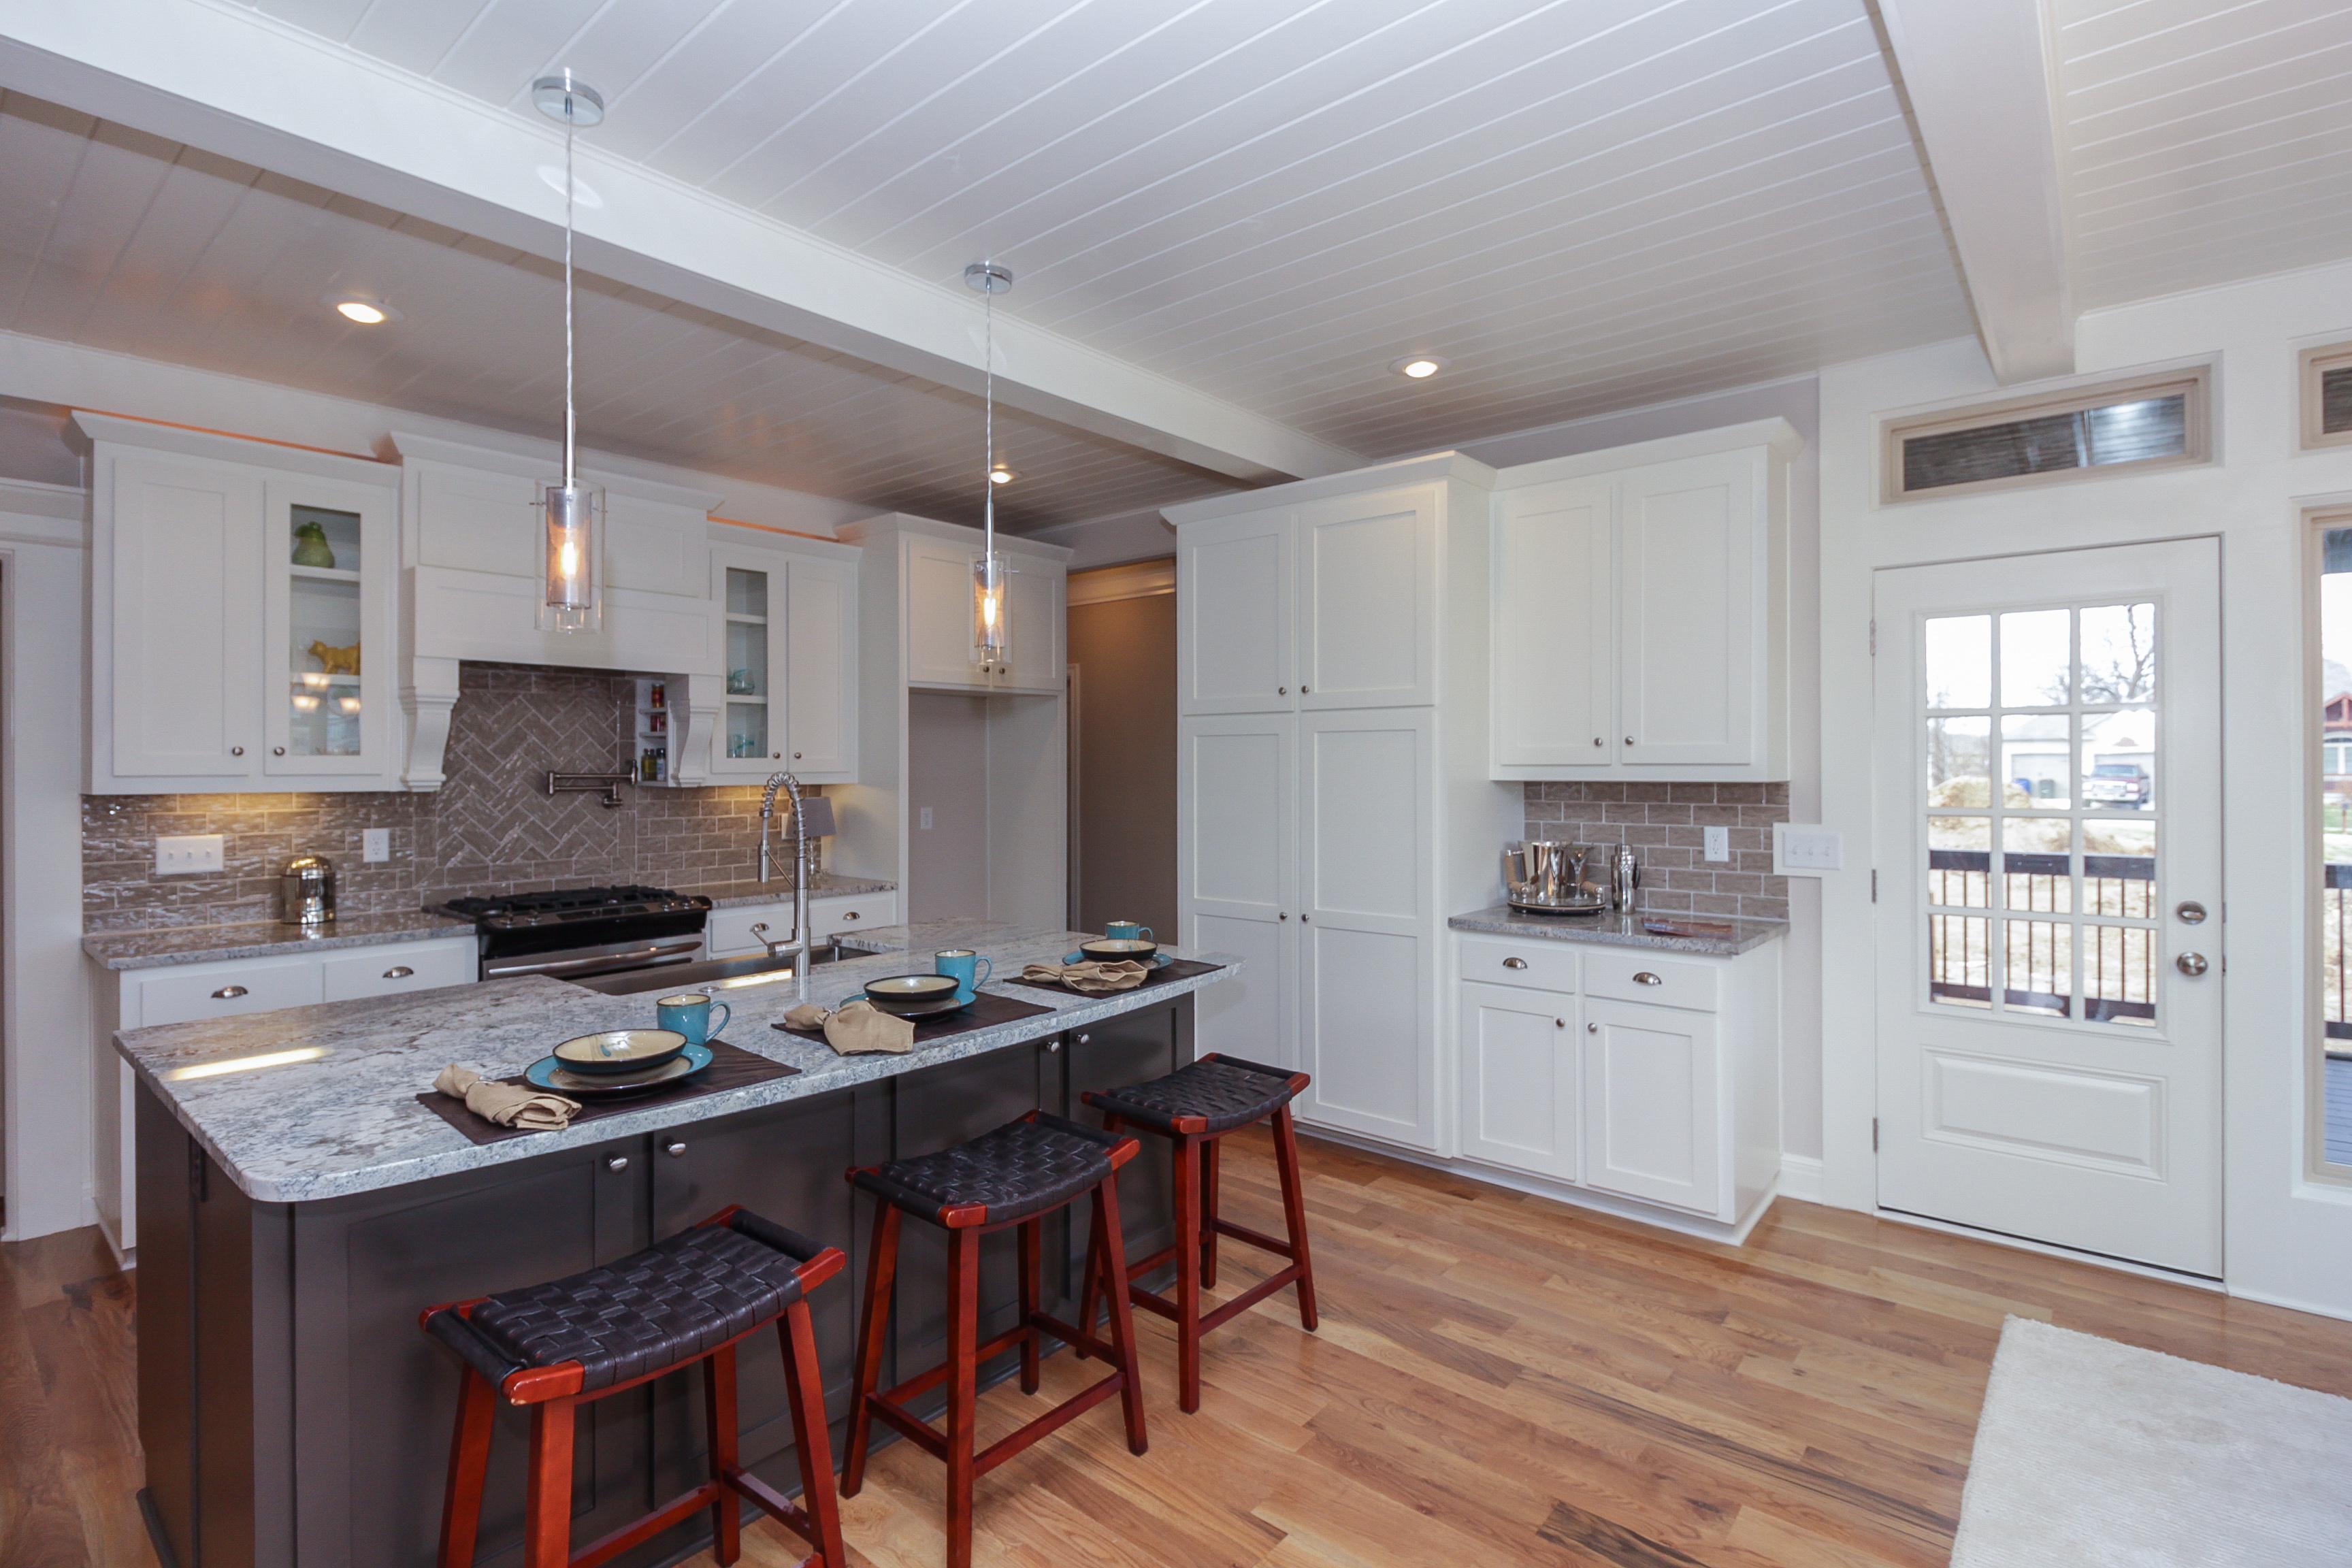 016_Kitchen wBeadboard Ceiling!